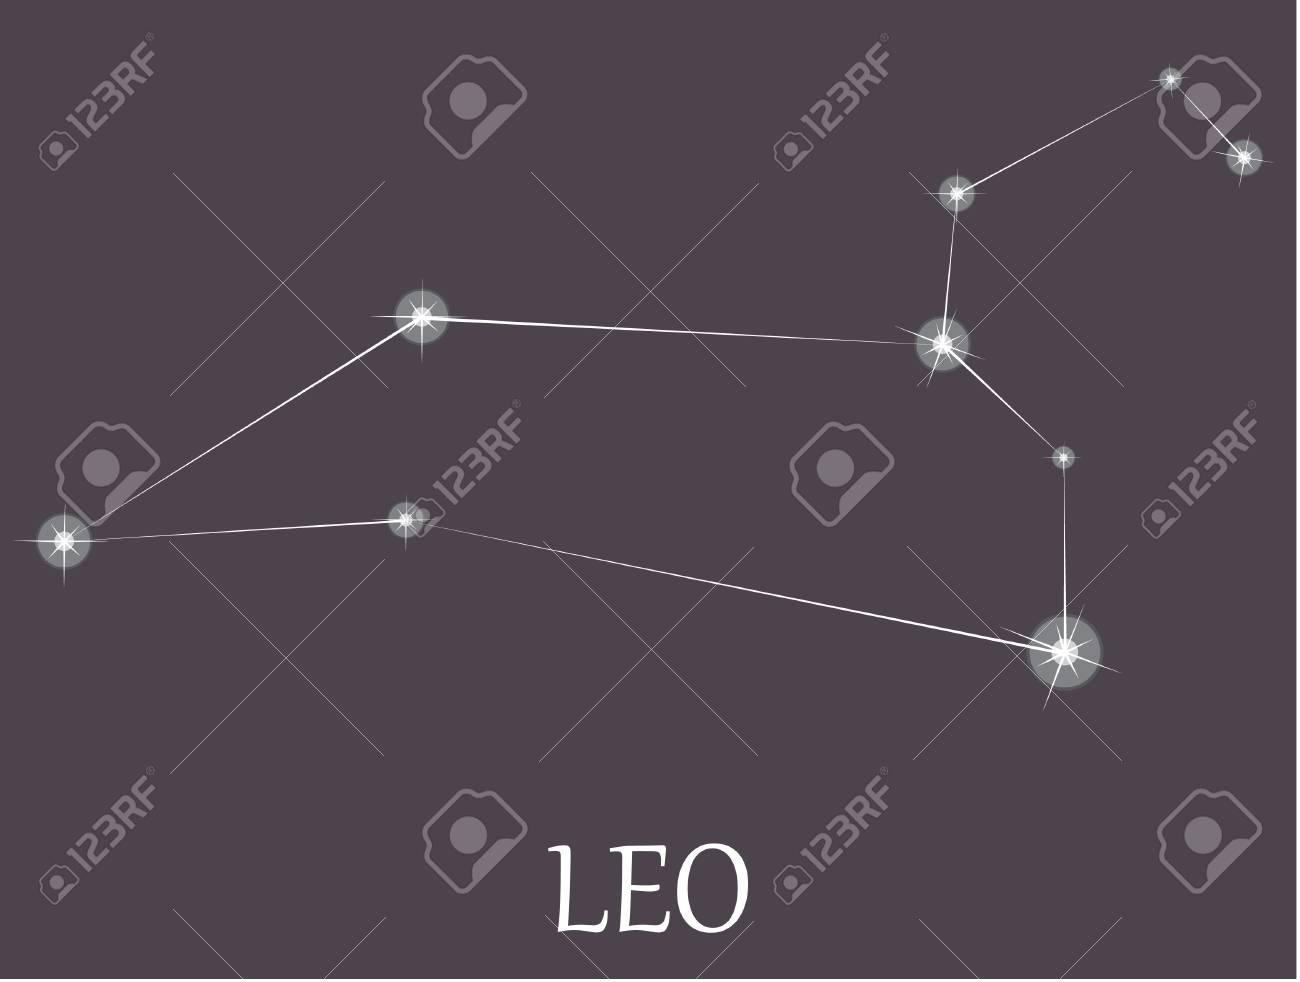 Leo Zodiac sign. Stock Vector - 19530338